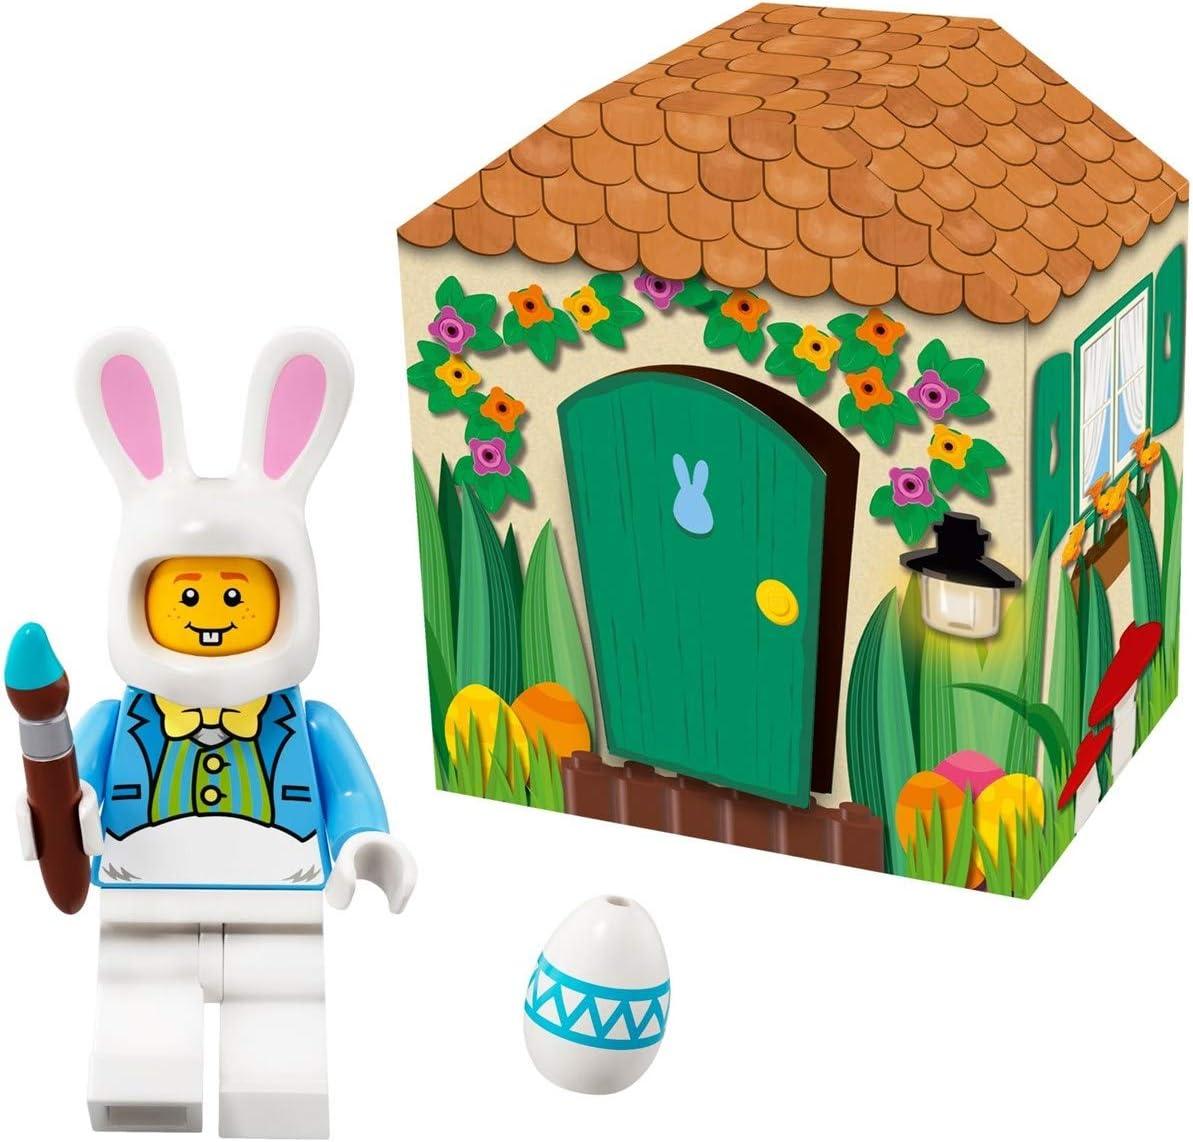 LEGO Easter Bunny Hut Iconic Easter Minifigure Set (5005249)